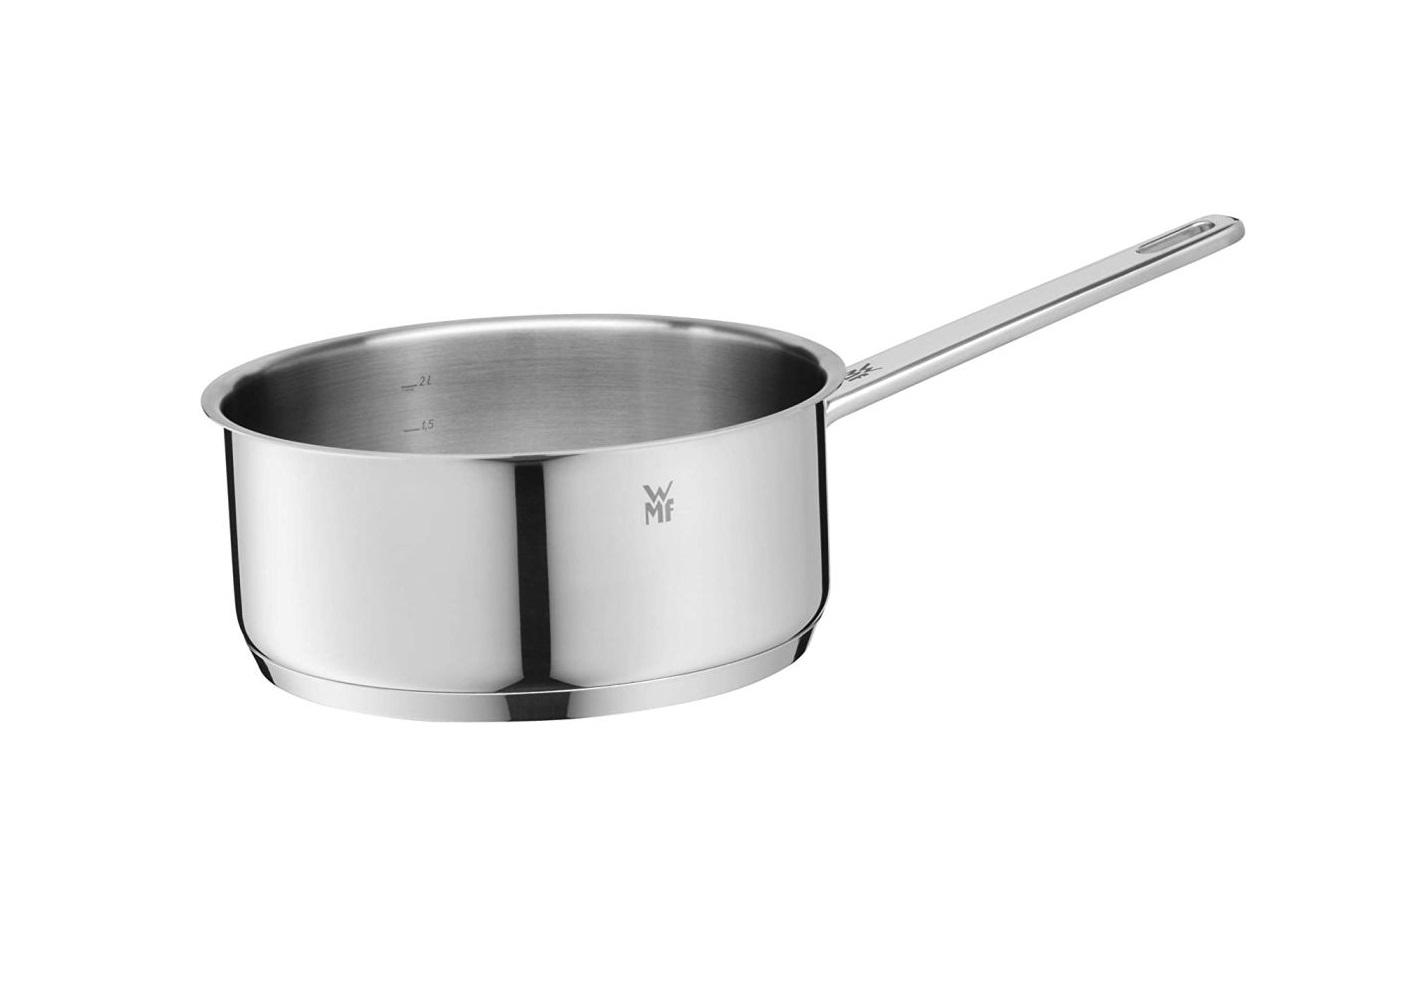 Rendlík Compact Cuisine 20 cm - WMF